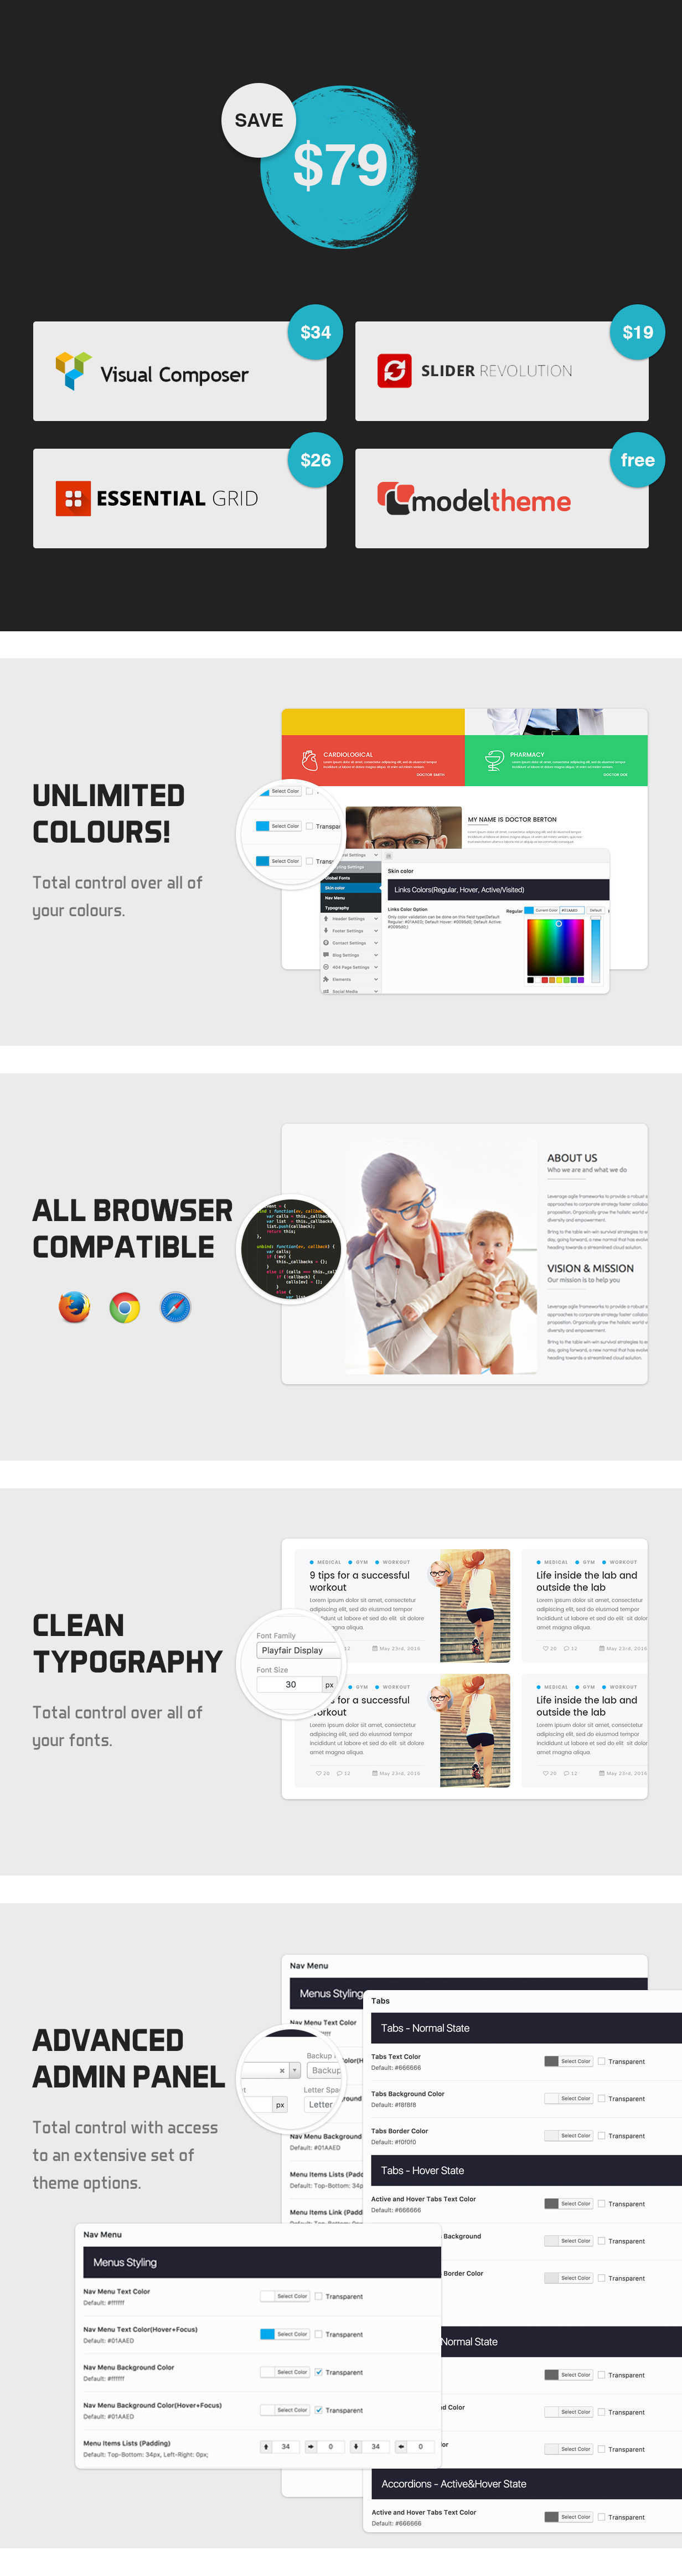 MedicaWP - A Stilish Medical / Hospital / Health WordPress Theme - 2